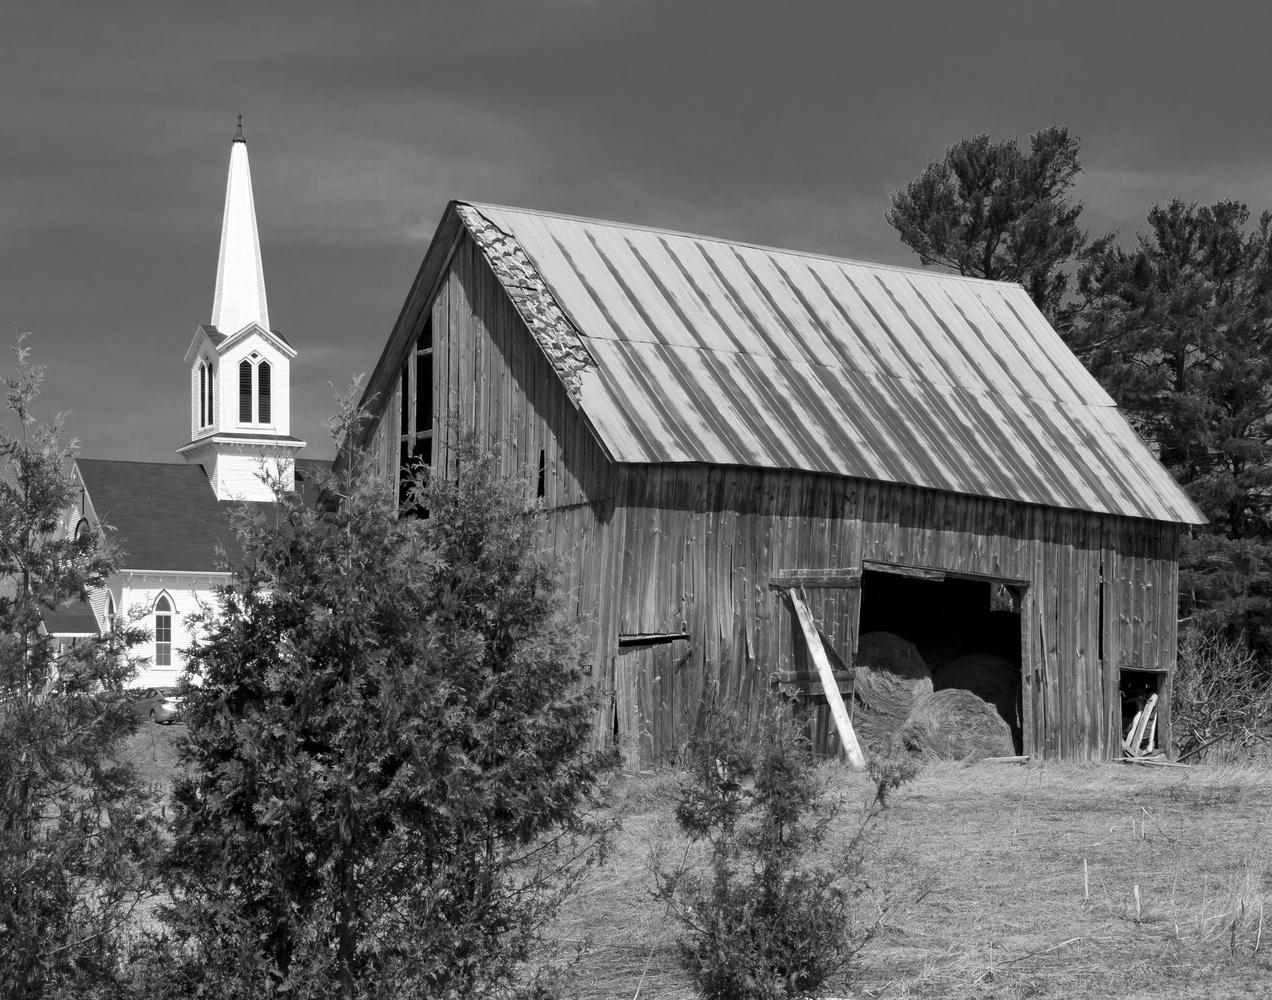 Keswick Ridge Barn by James Jewers